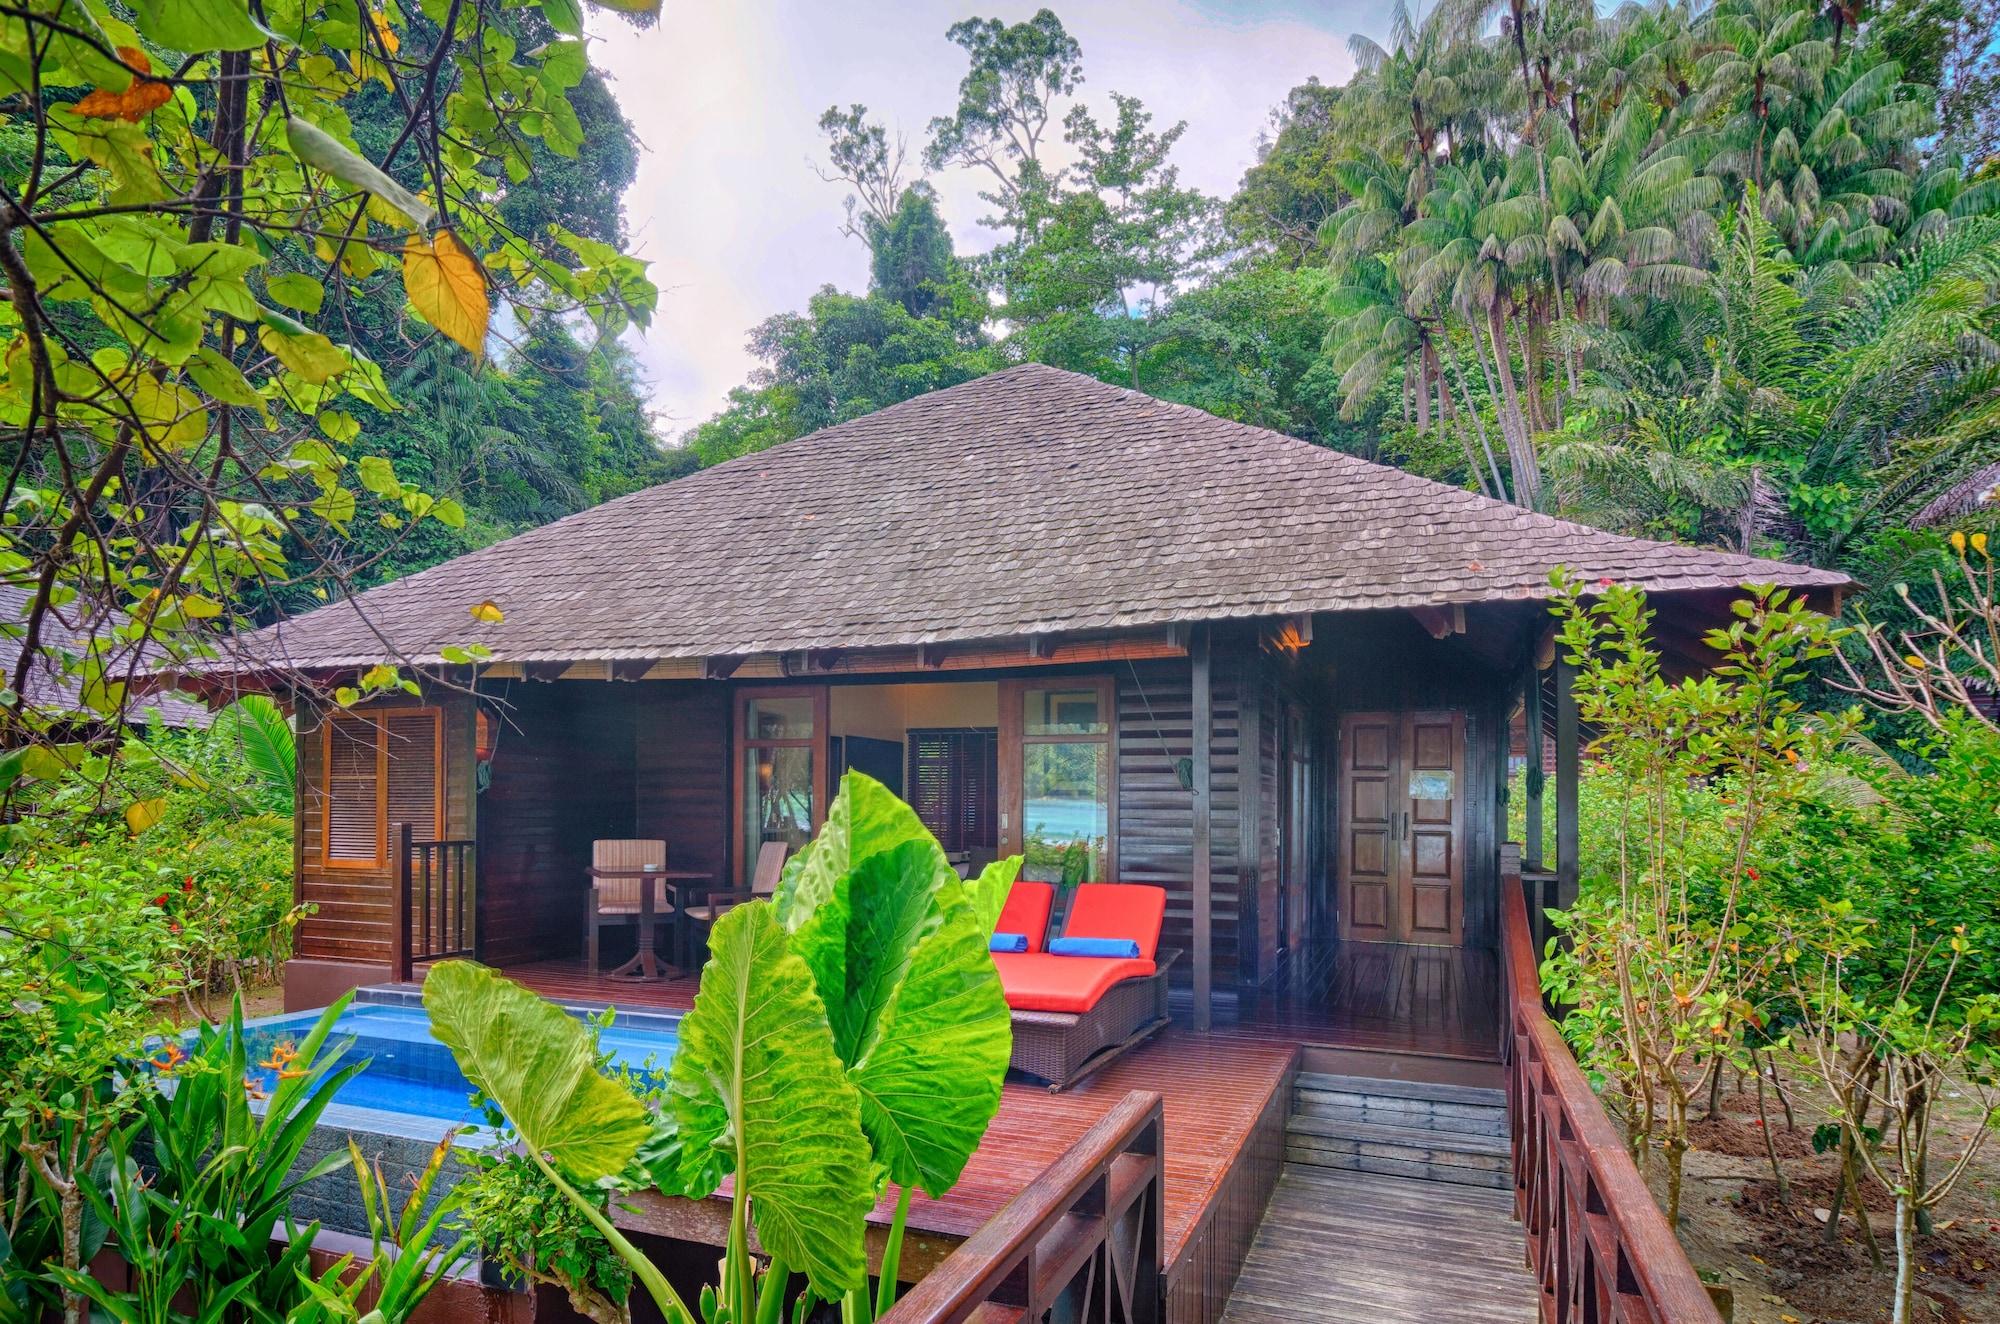 Bunga Raya Island Resort & Spa, Kota Kinabalu